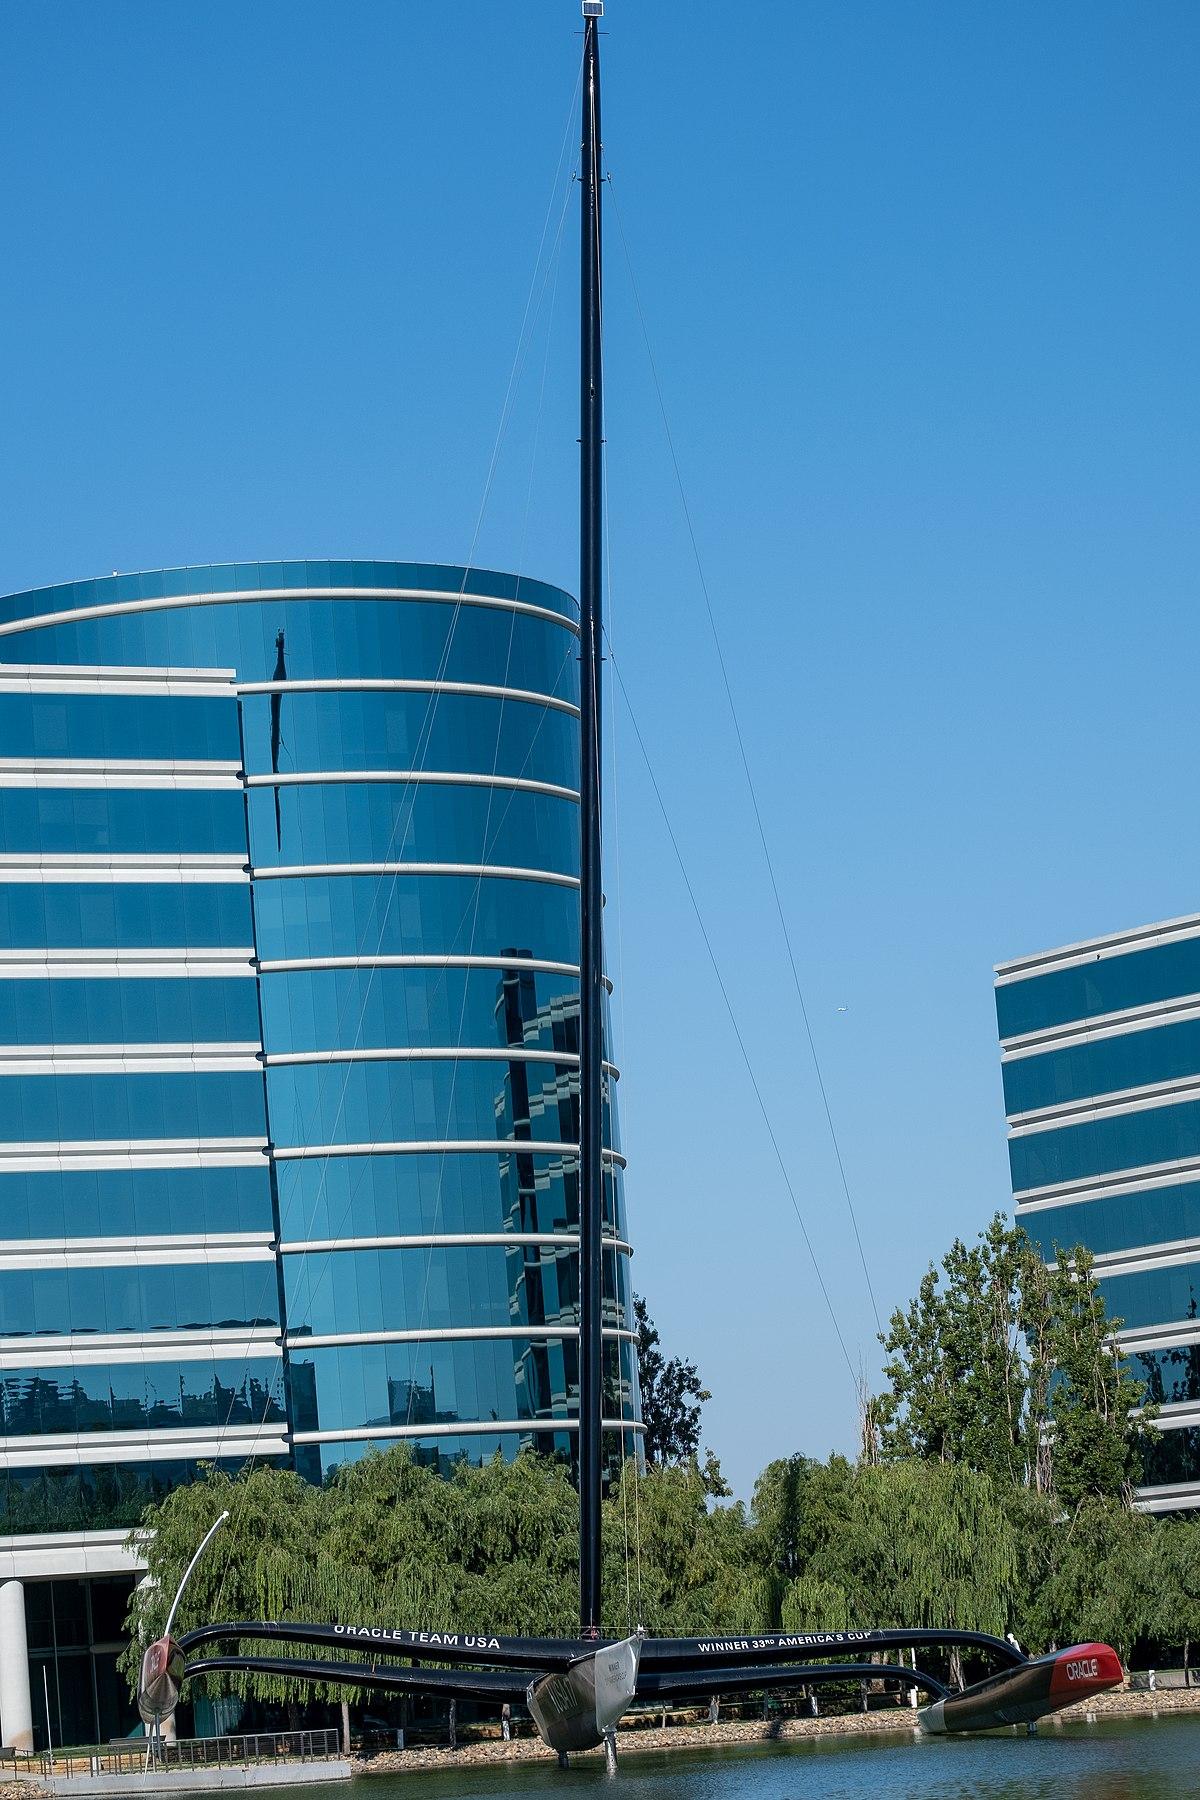 Oracle (entreprise) — Wikipédia